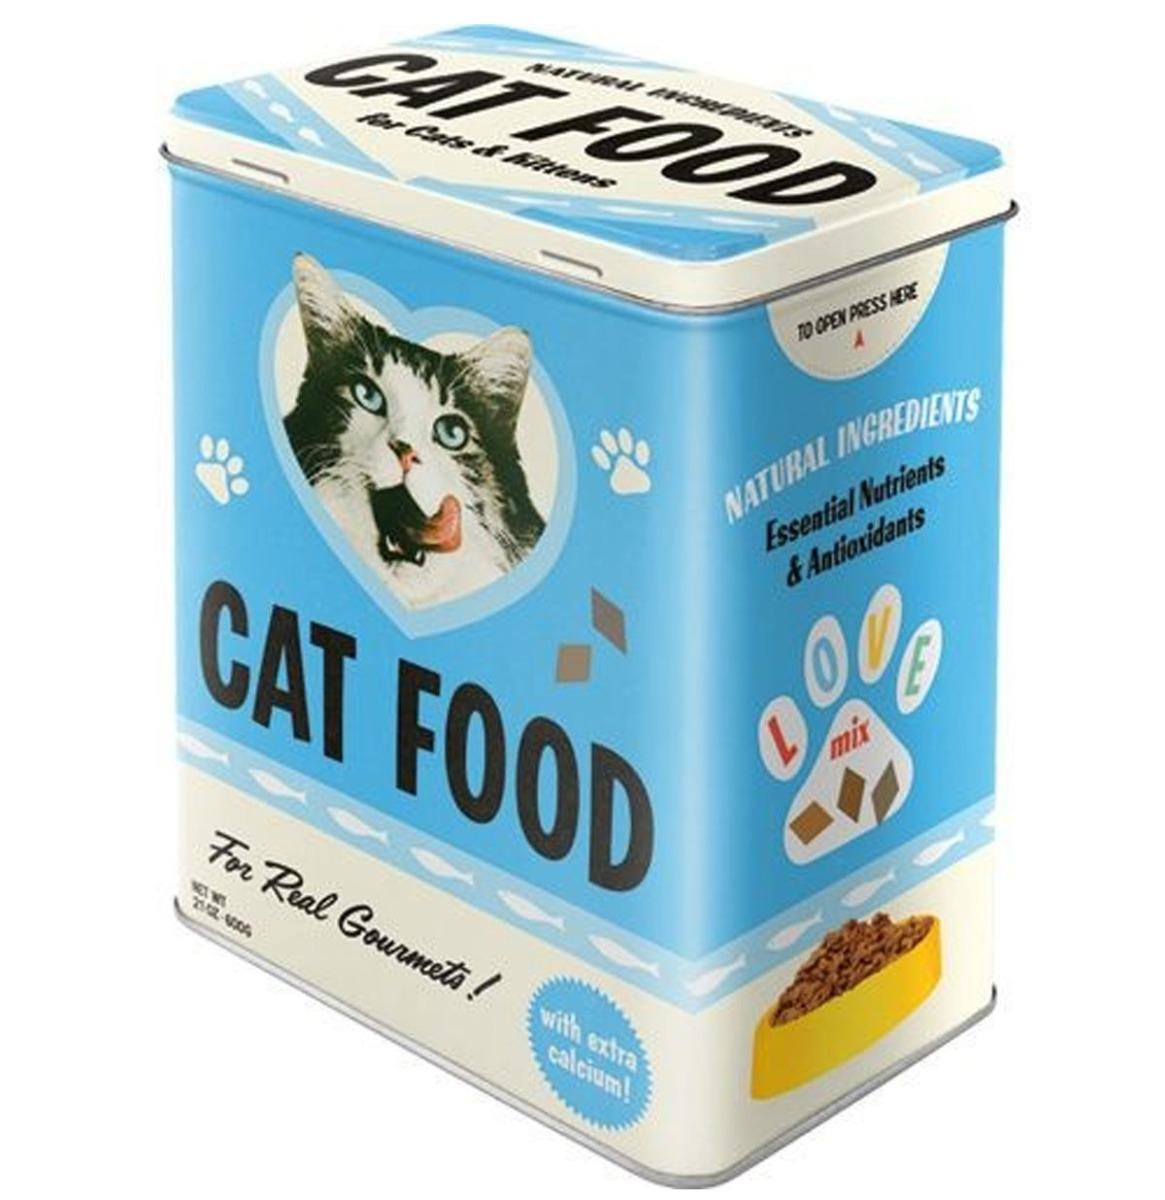 Cat Food Tinnen Blik